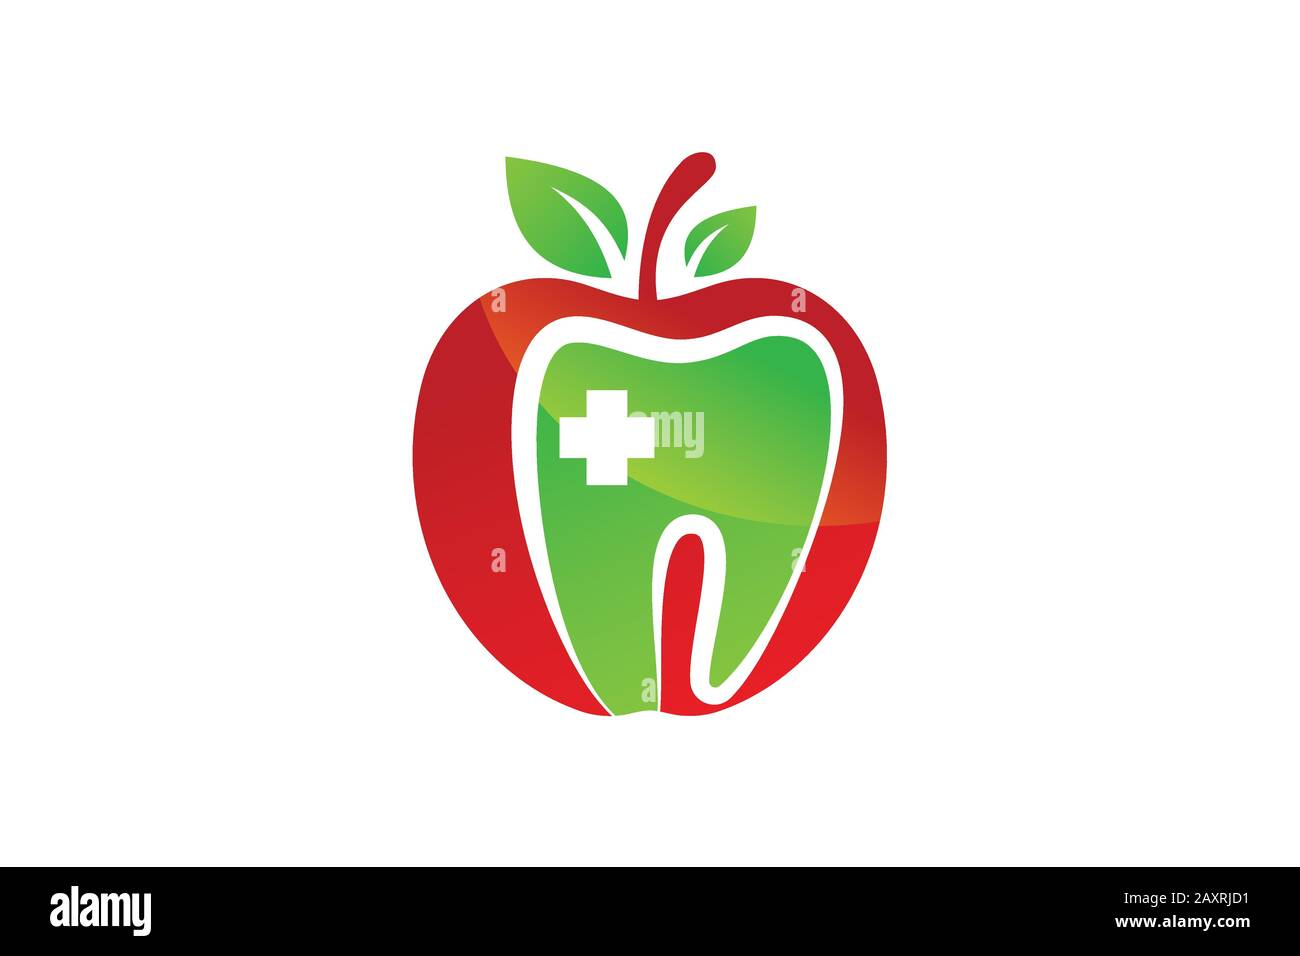 Dental Apple Logo Sign Symbol Design Green Apple Tooth Teeth Dent Dental Dentist Image Icon Stock Vector Image Art Alamy